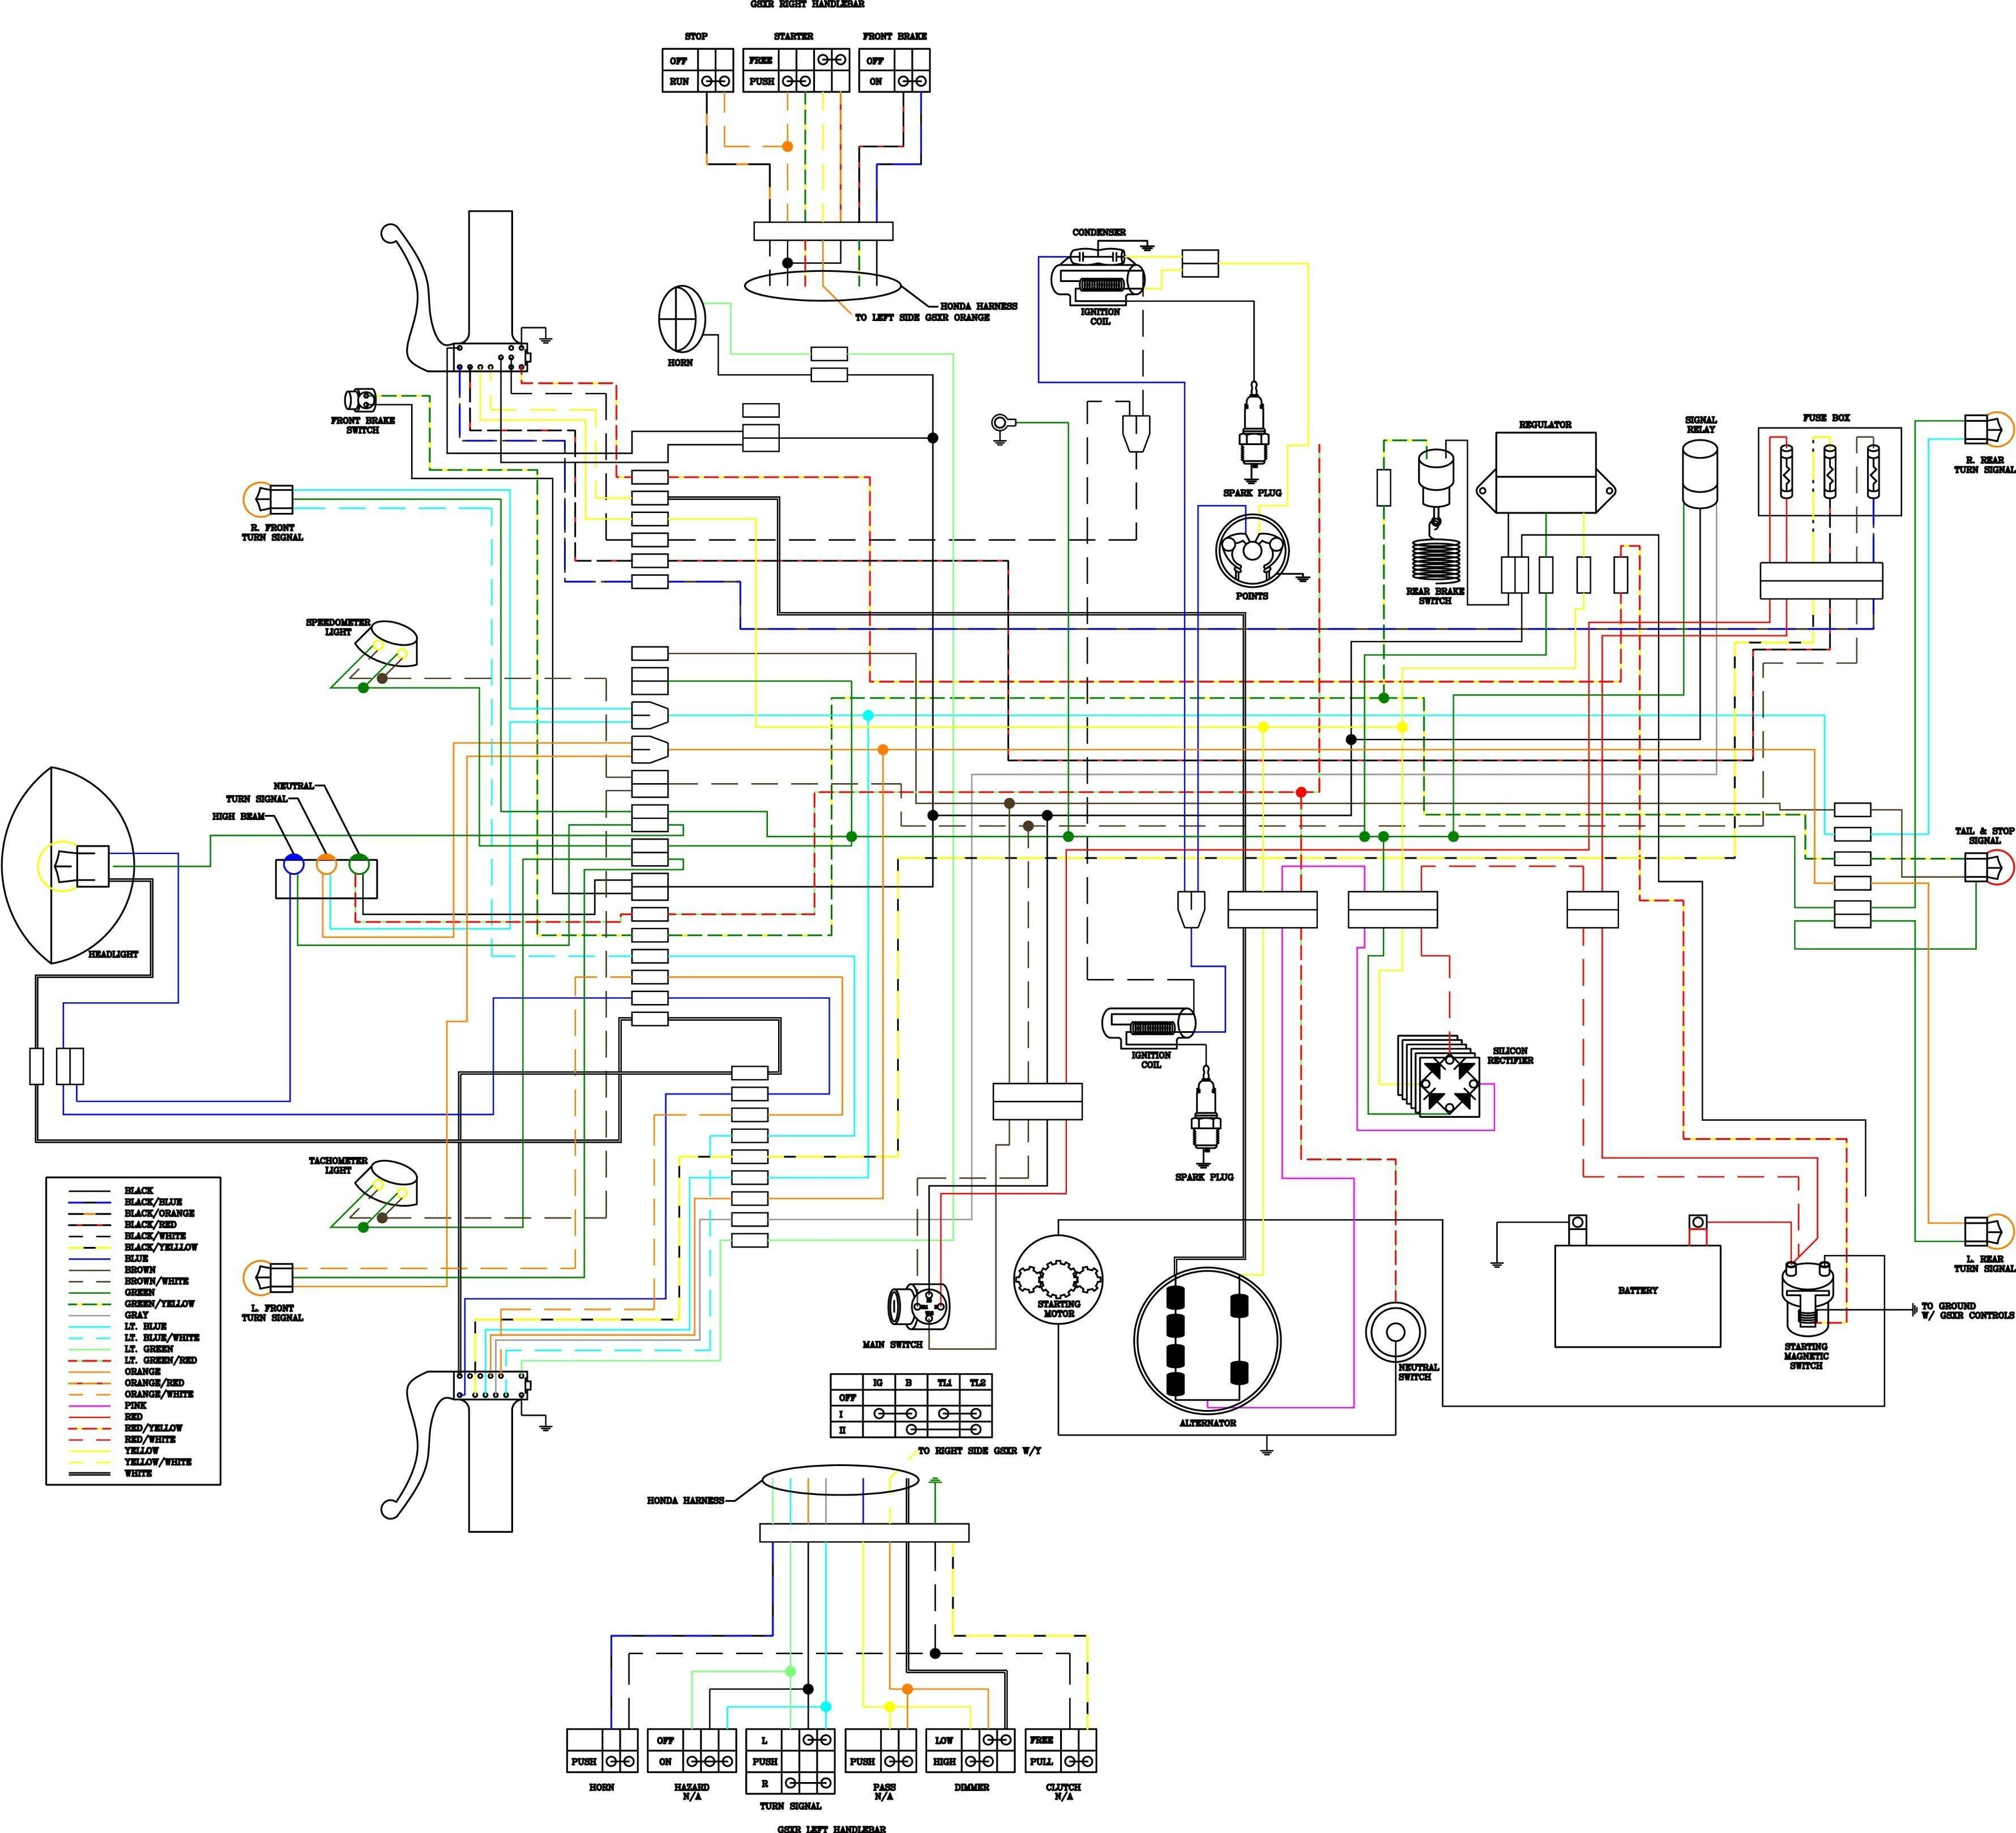 New Cb360 Wiring Diagram In 2020